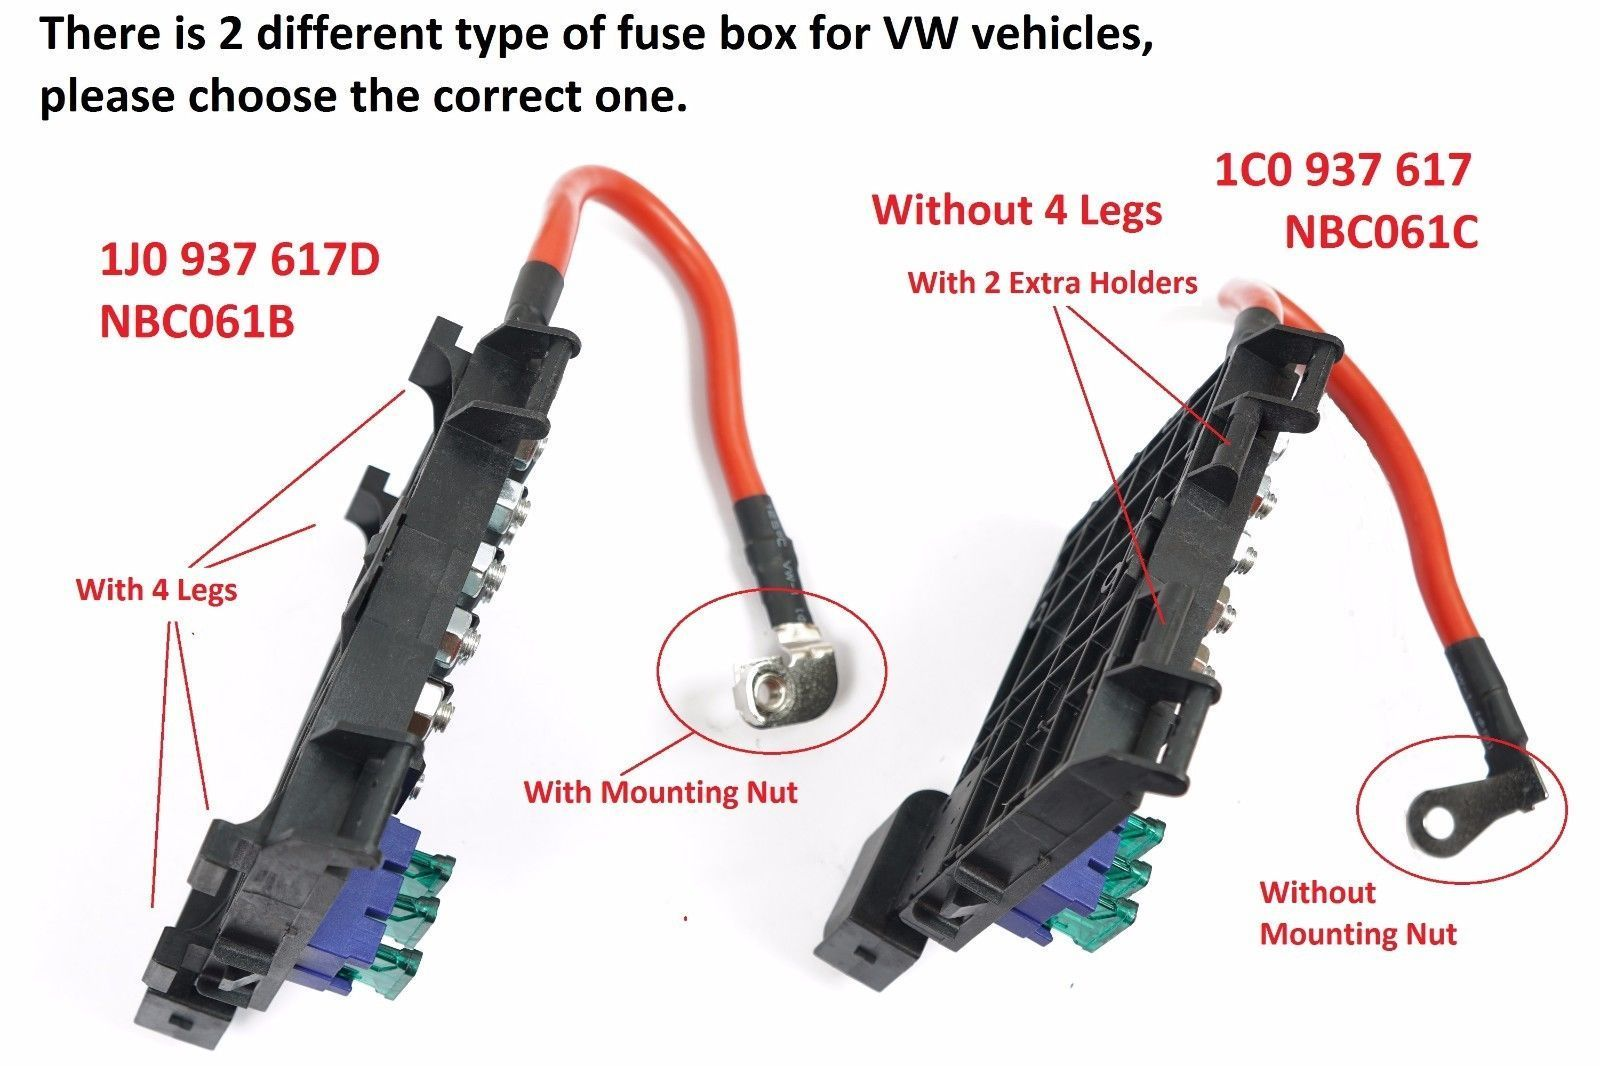 hight resolution of nomorebreaking fuse box for vw jetta golf beetle 1 8l 2 0l 1j0937617d nbc061b